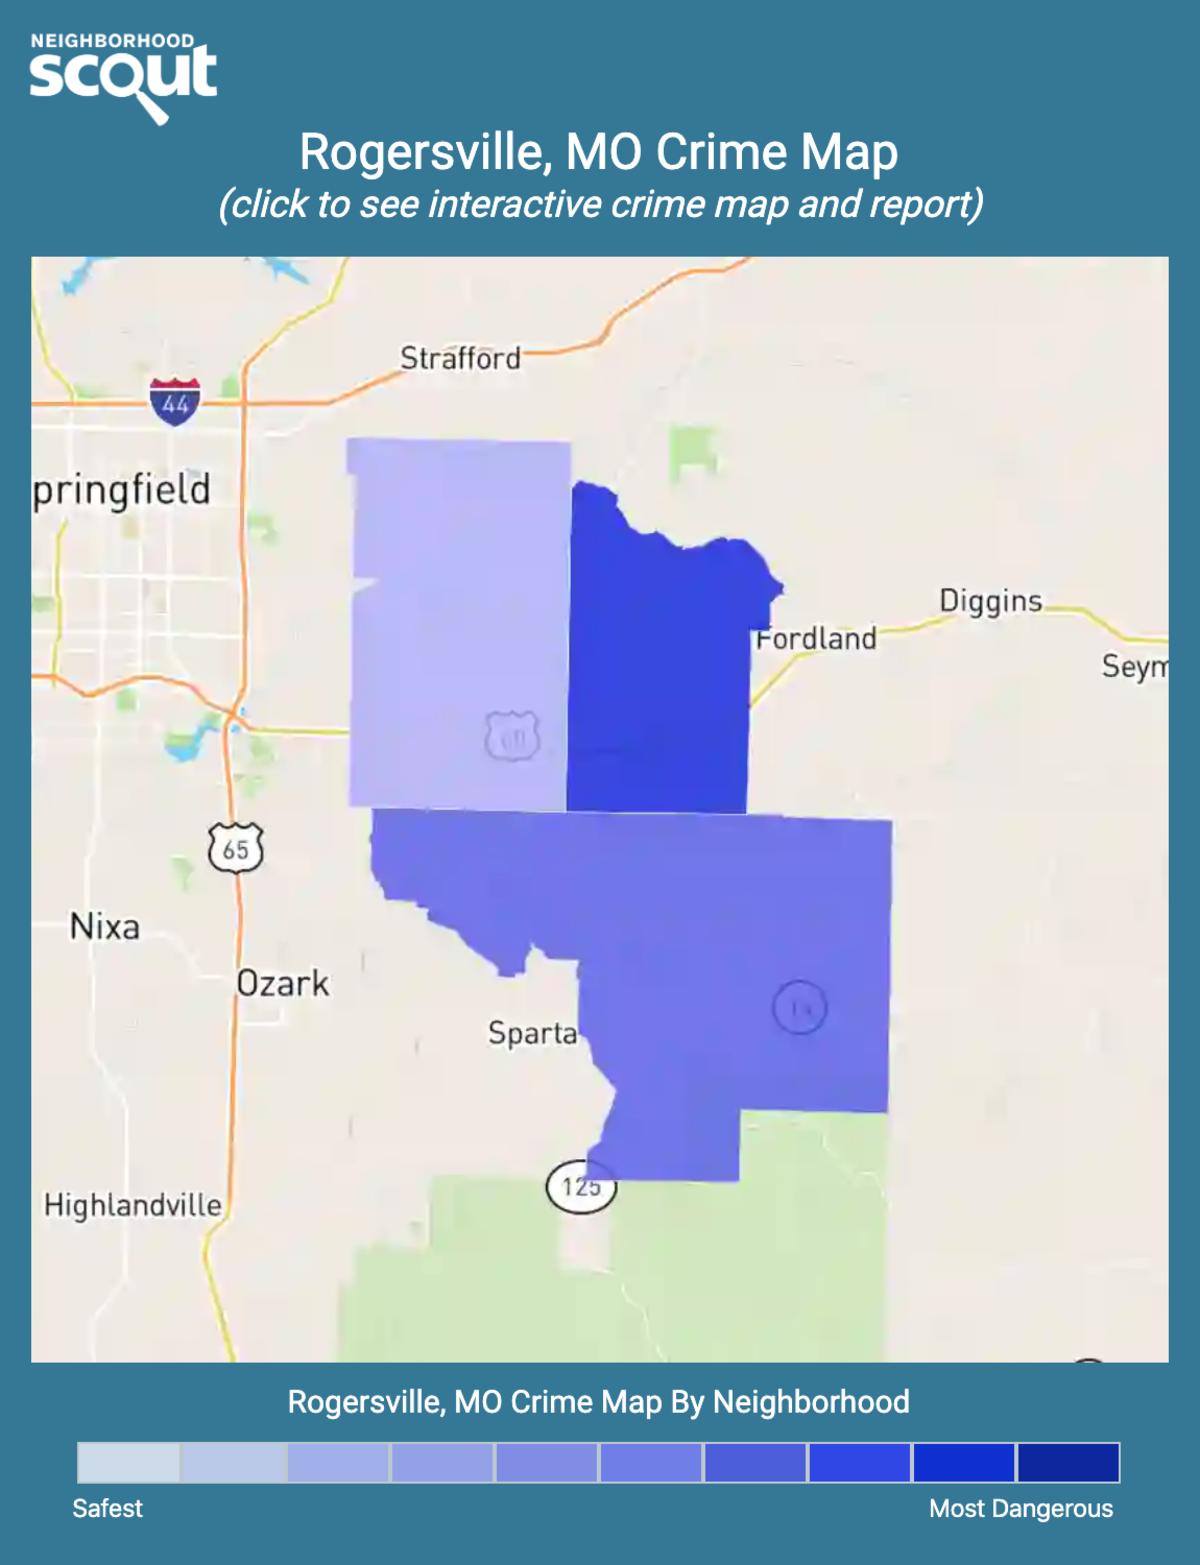 Rogersville, Missouri crime map